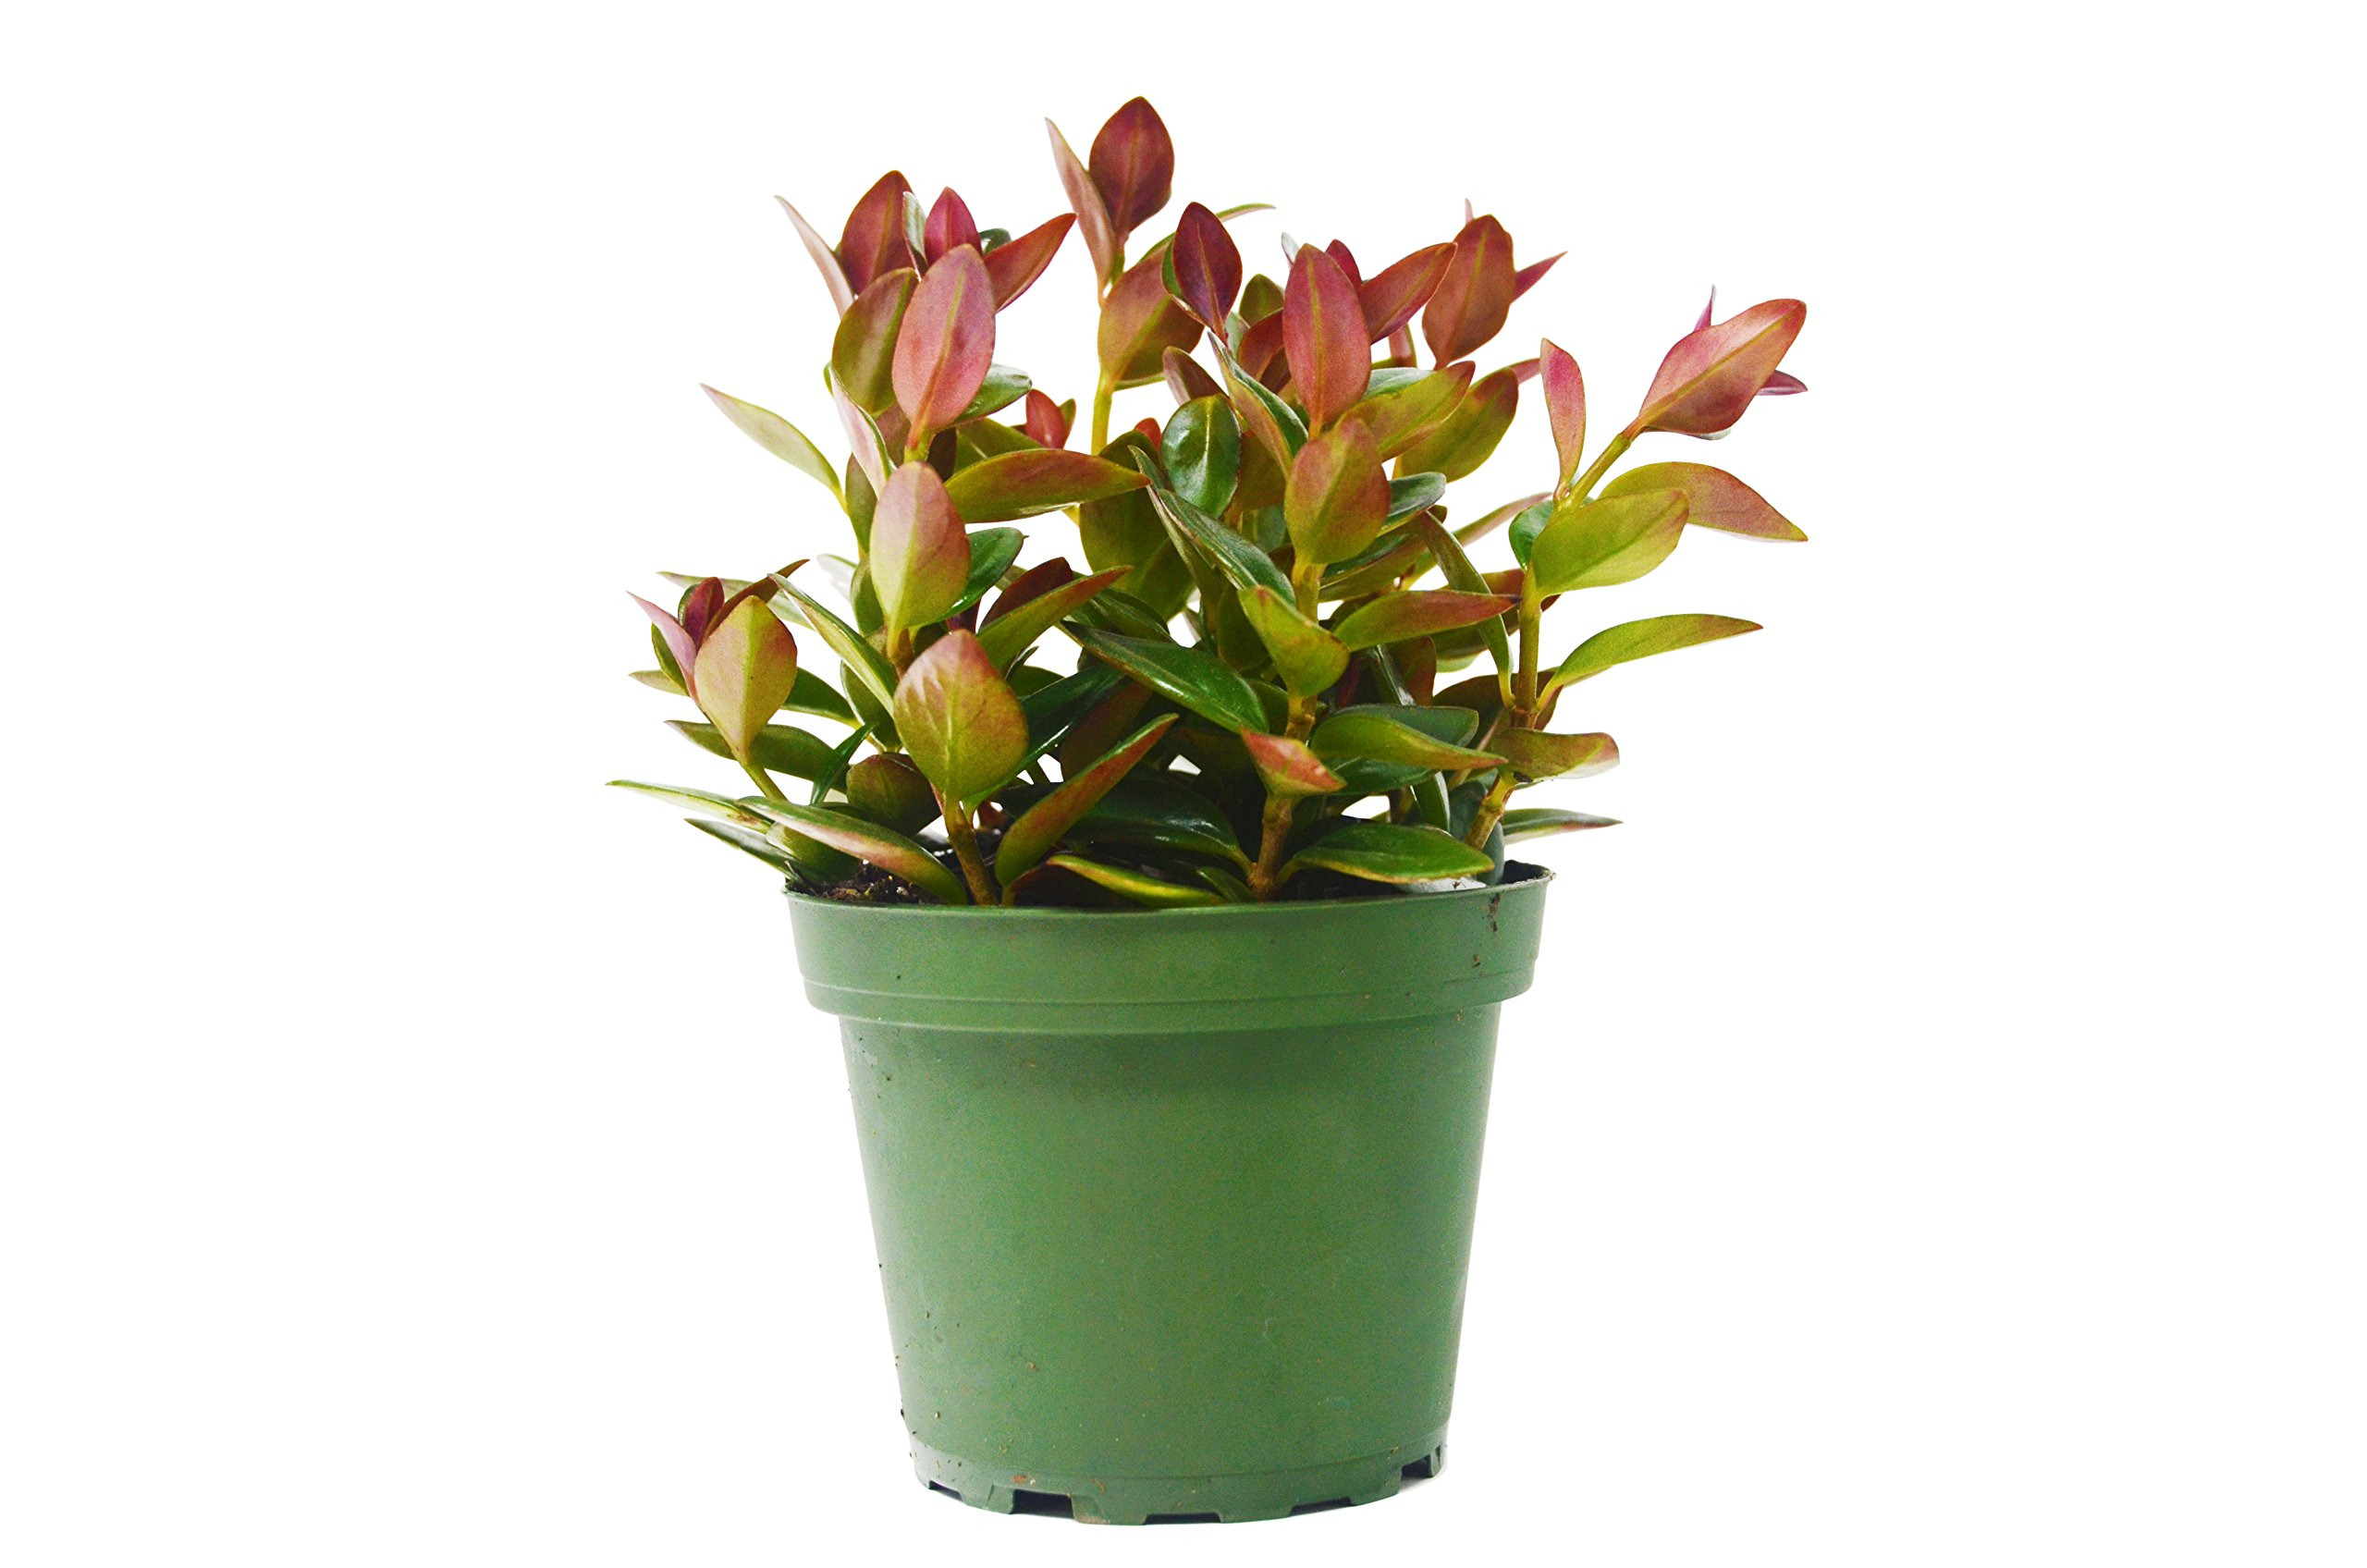 Black Goldfish Plant - Live House Plant - FREE Care Guide - 4'' Pot